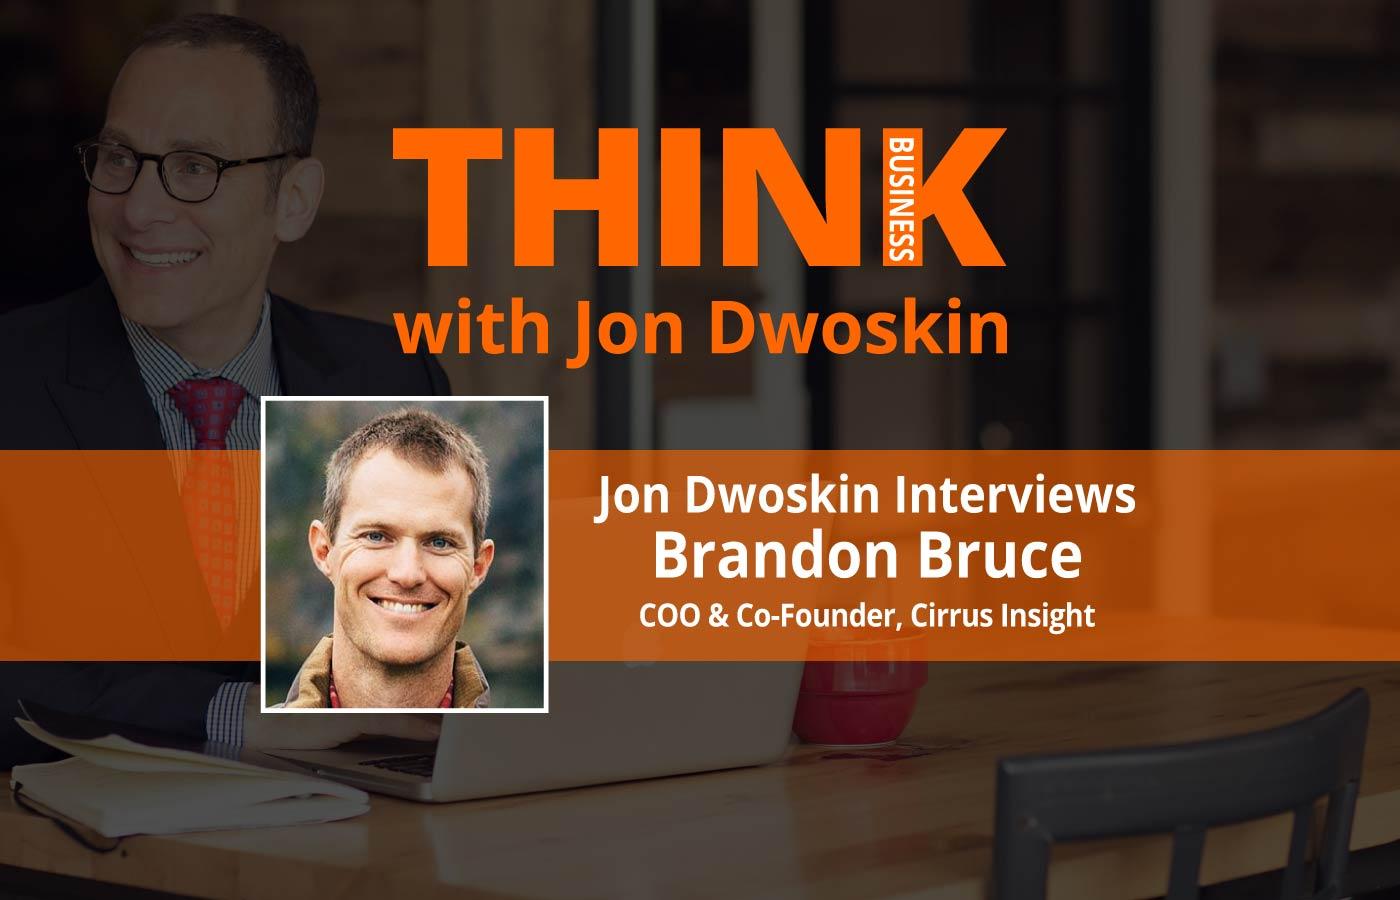 THINK Business Podcast: Jon Dwoskin Interviews Brandon Bruce, COO & Co-Founder, Cirrus Insight